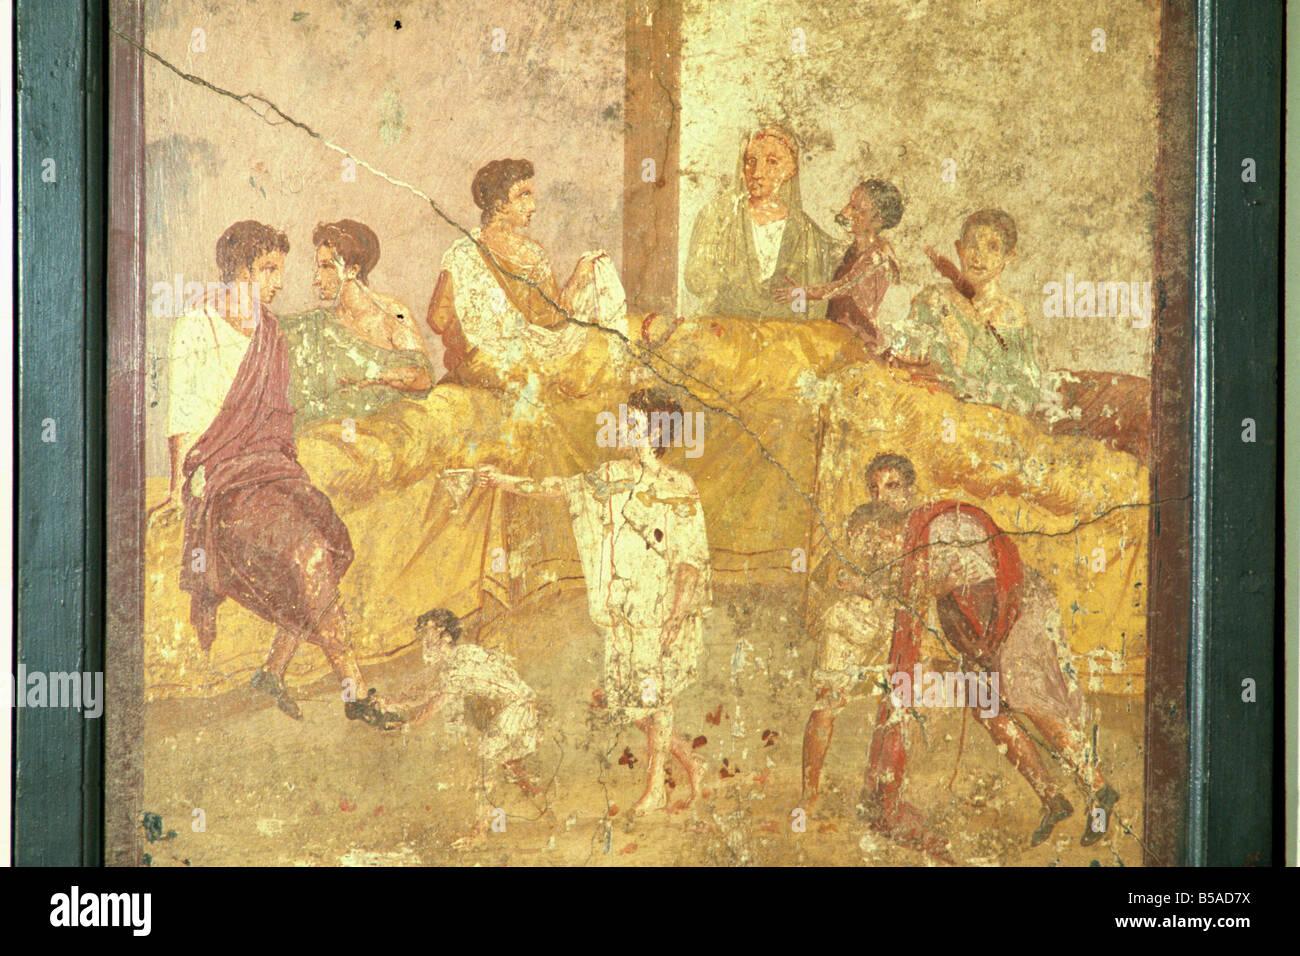 Peinture Murale De Pompéi En Campanie Italie W Rawlings